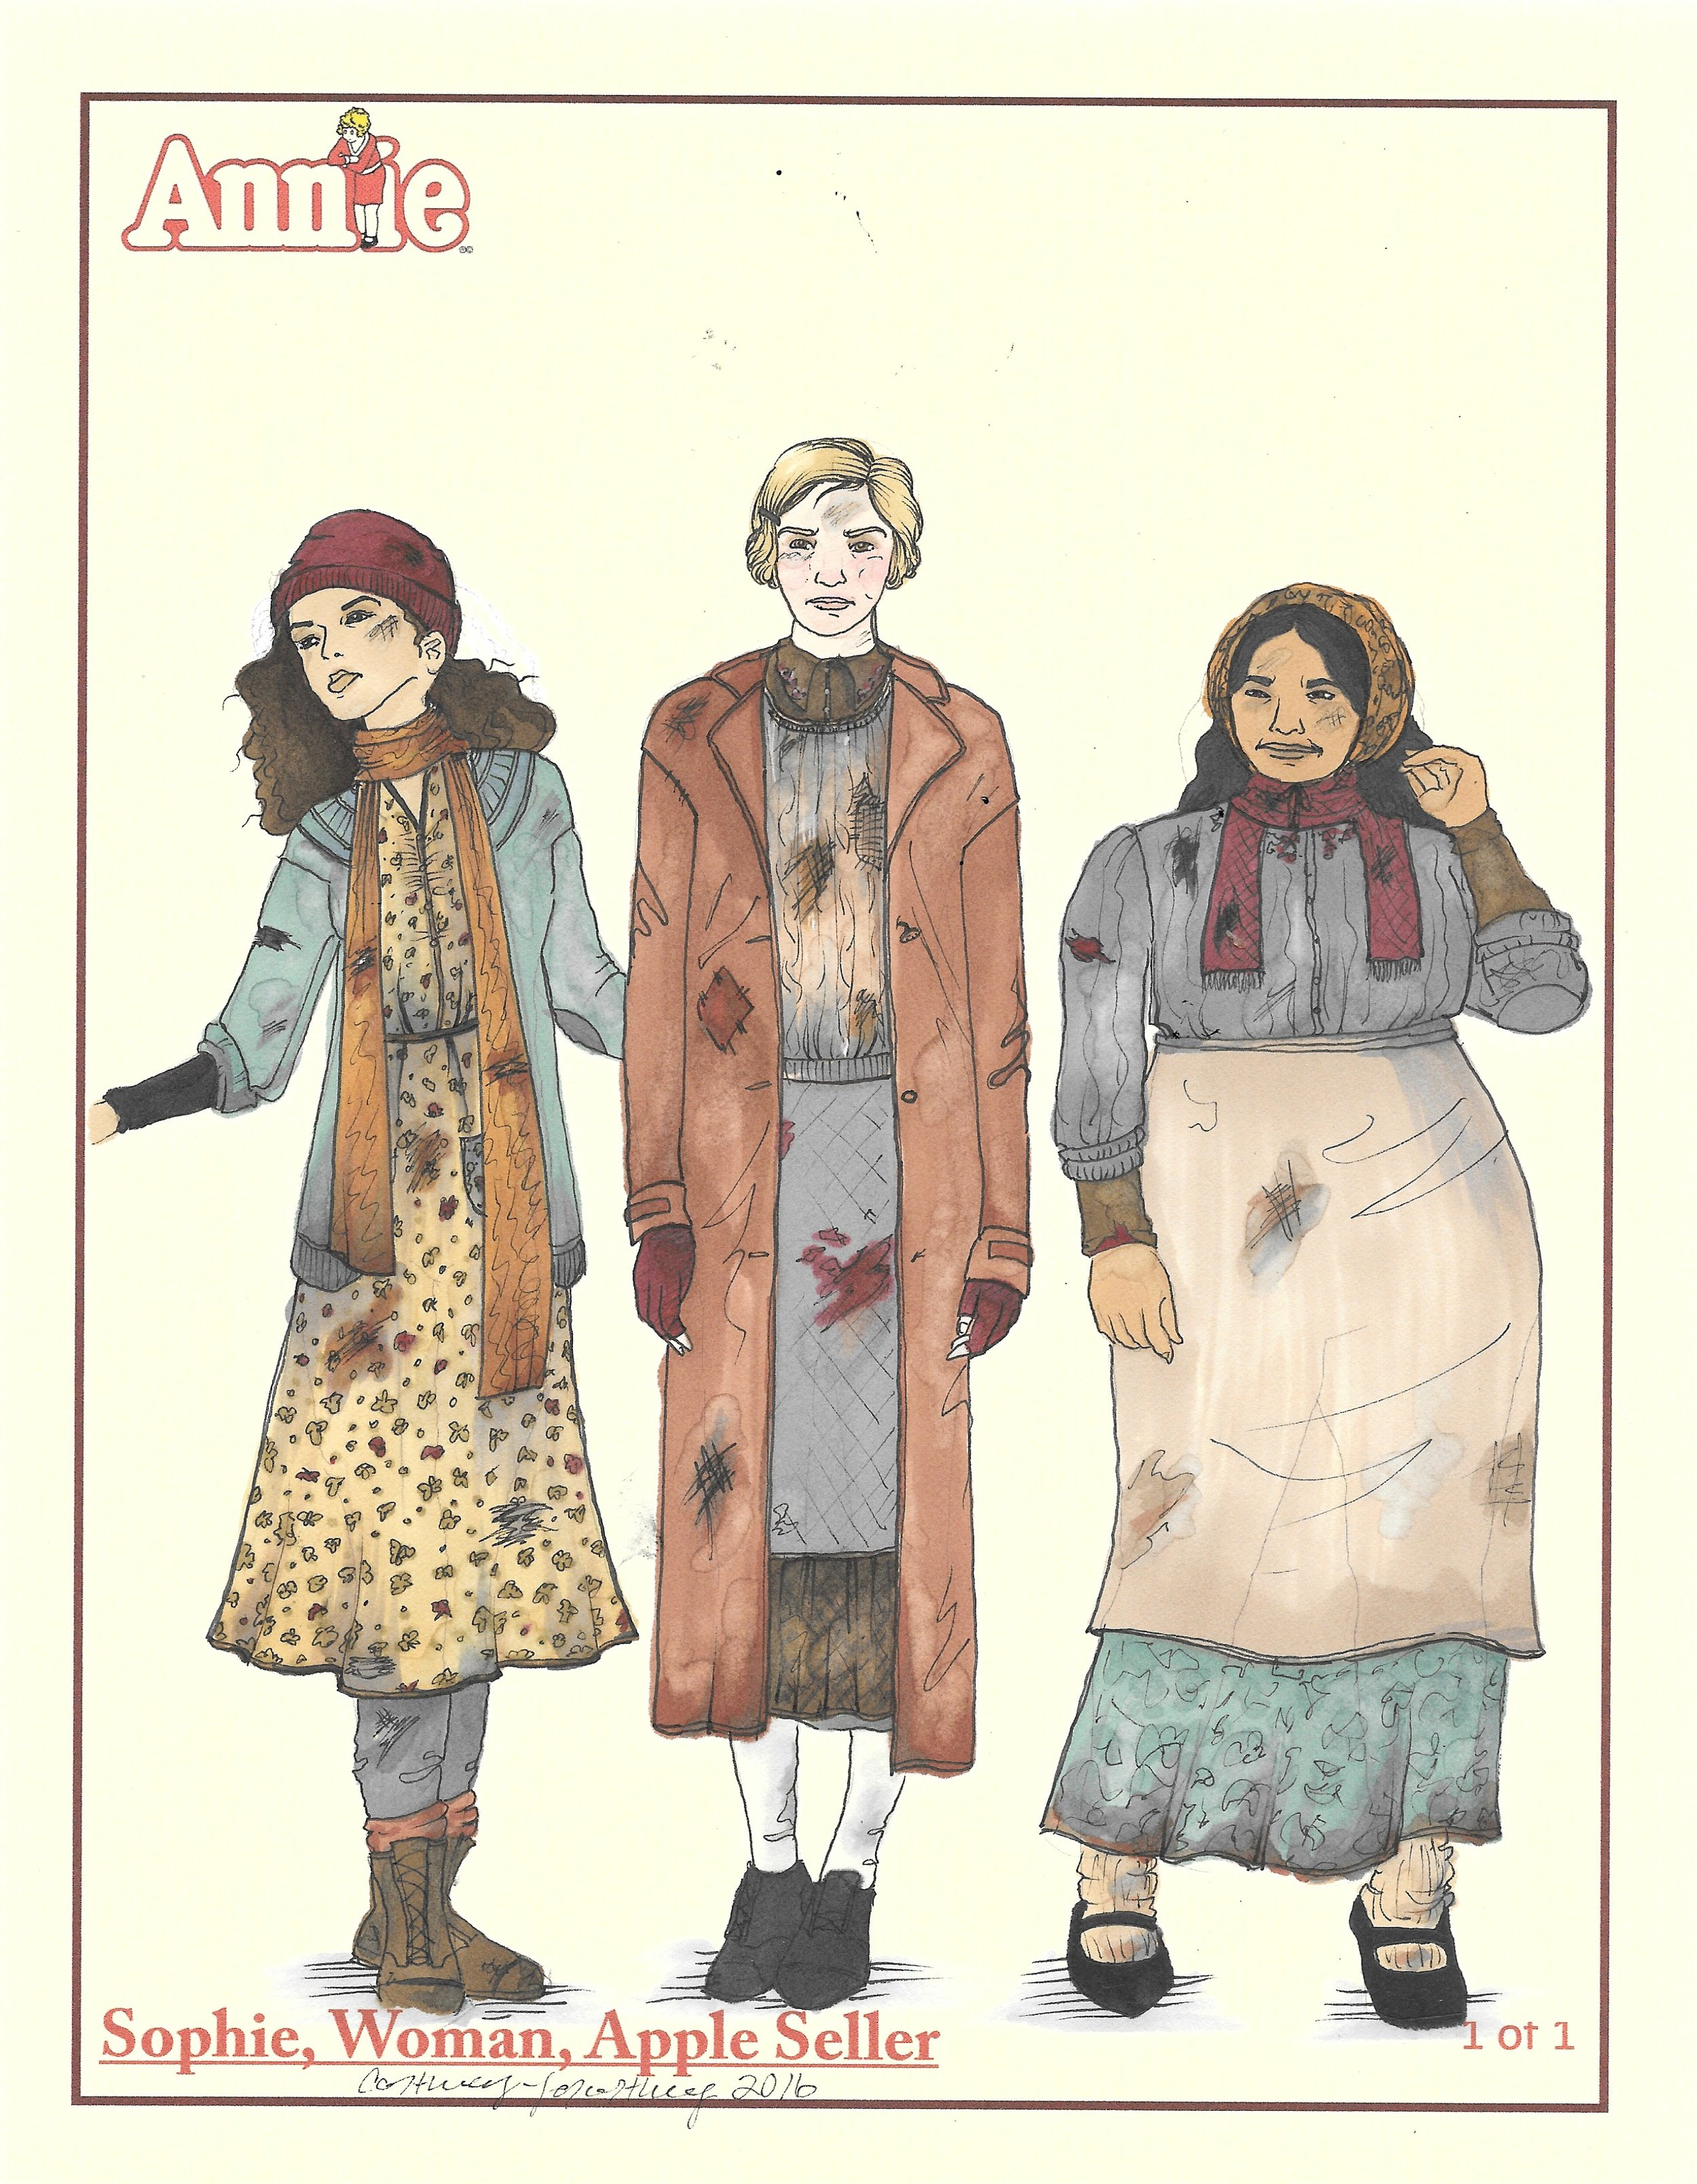 Hooverville women